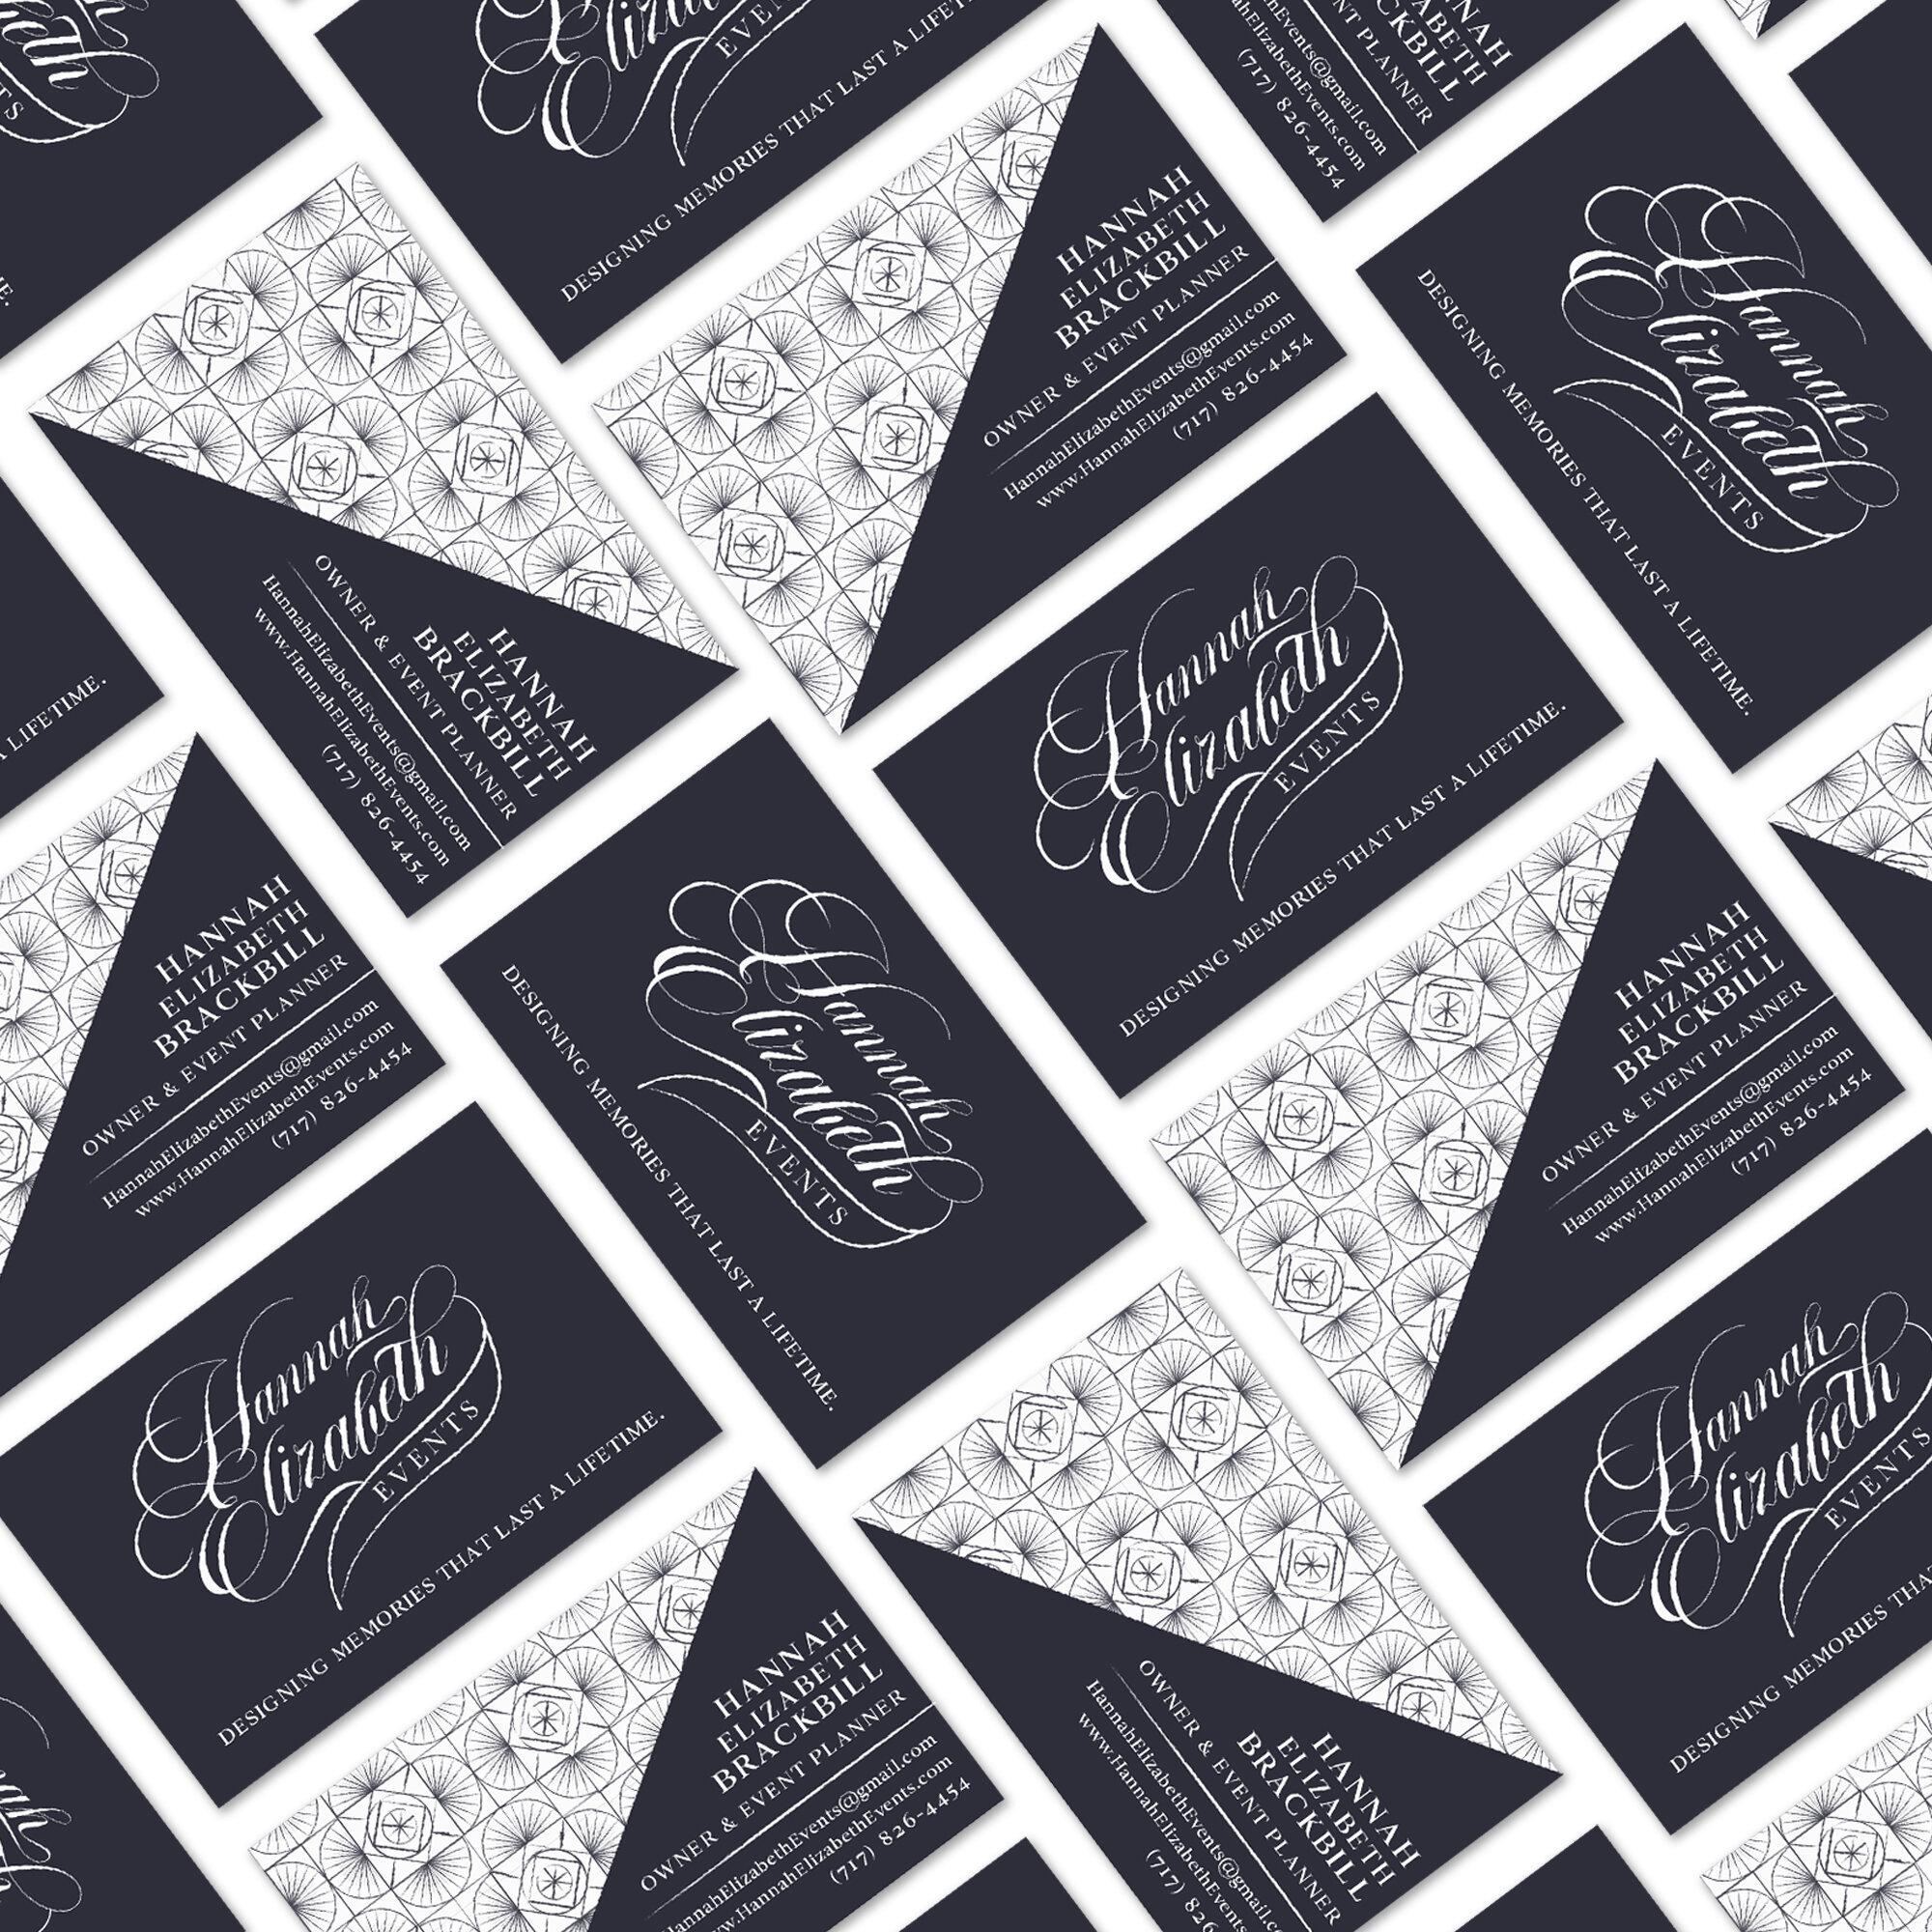 Business Cards2.jpg